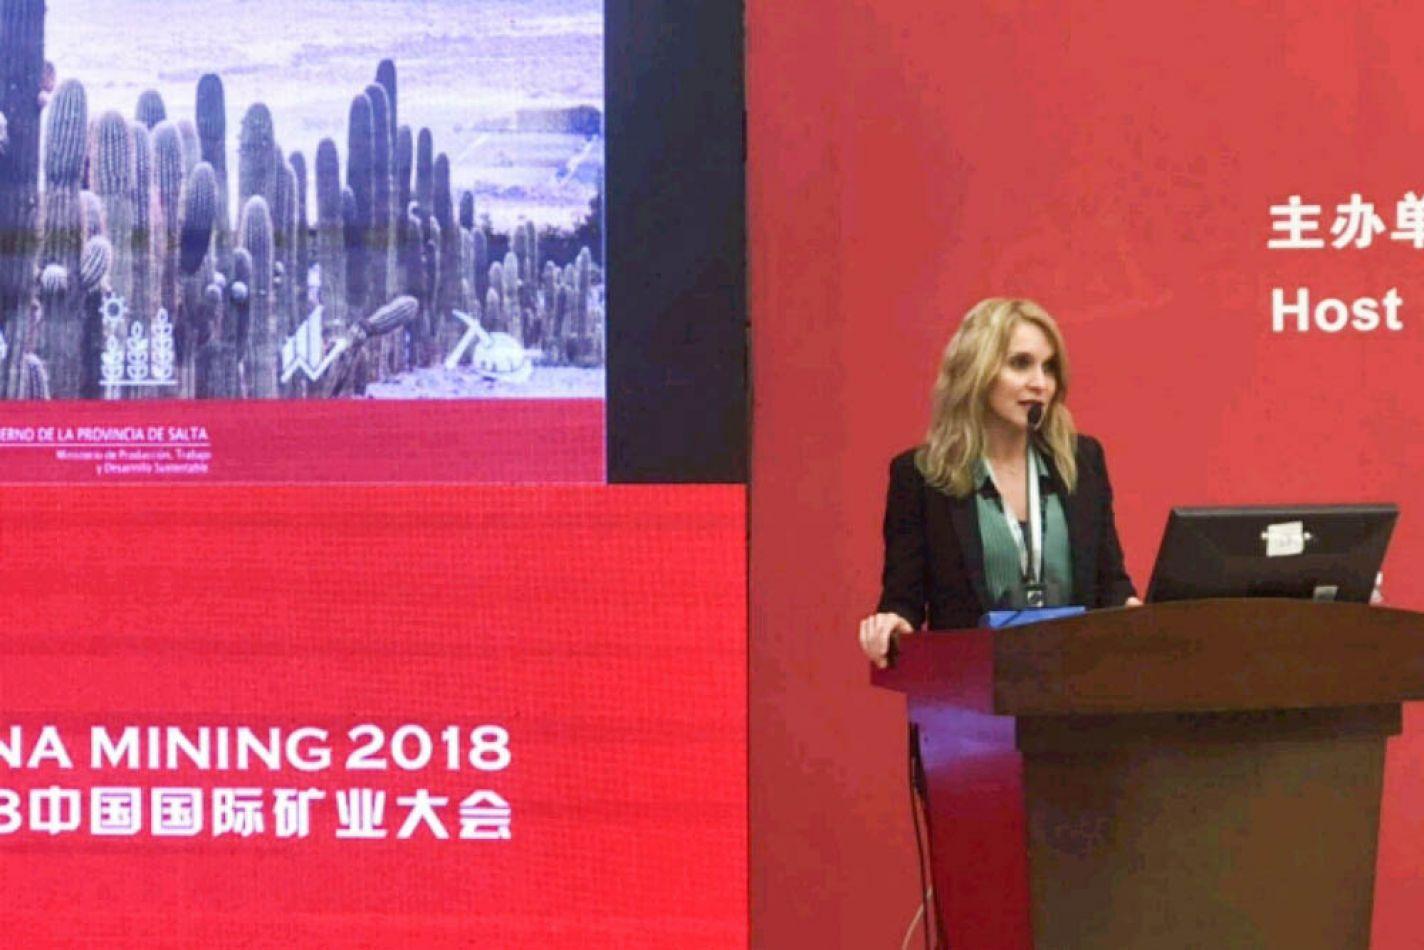 China Minning 2018